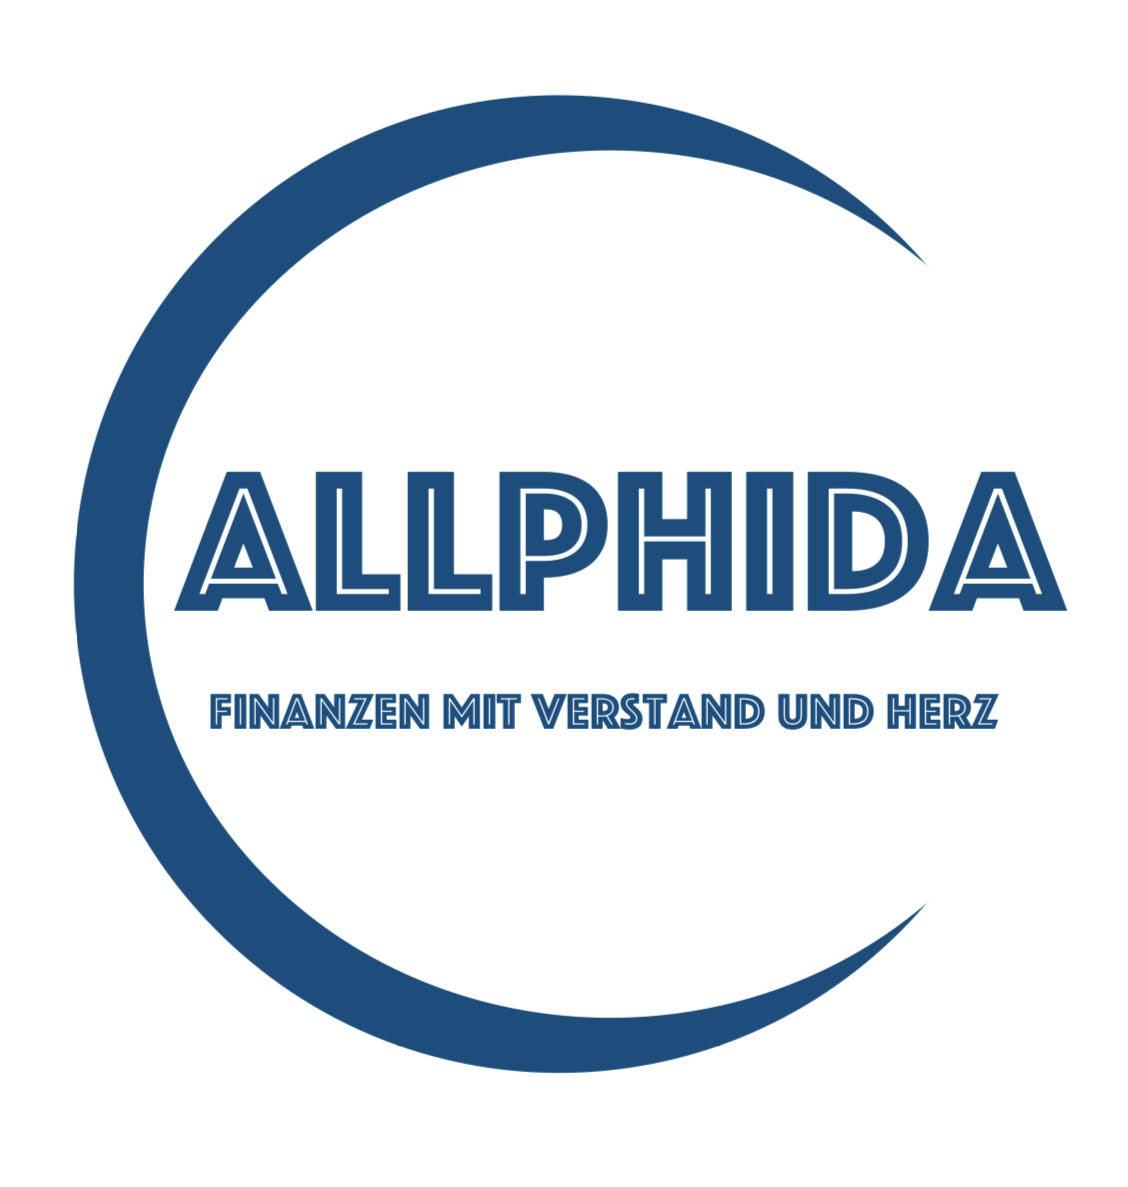 Allphida